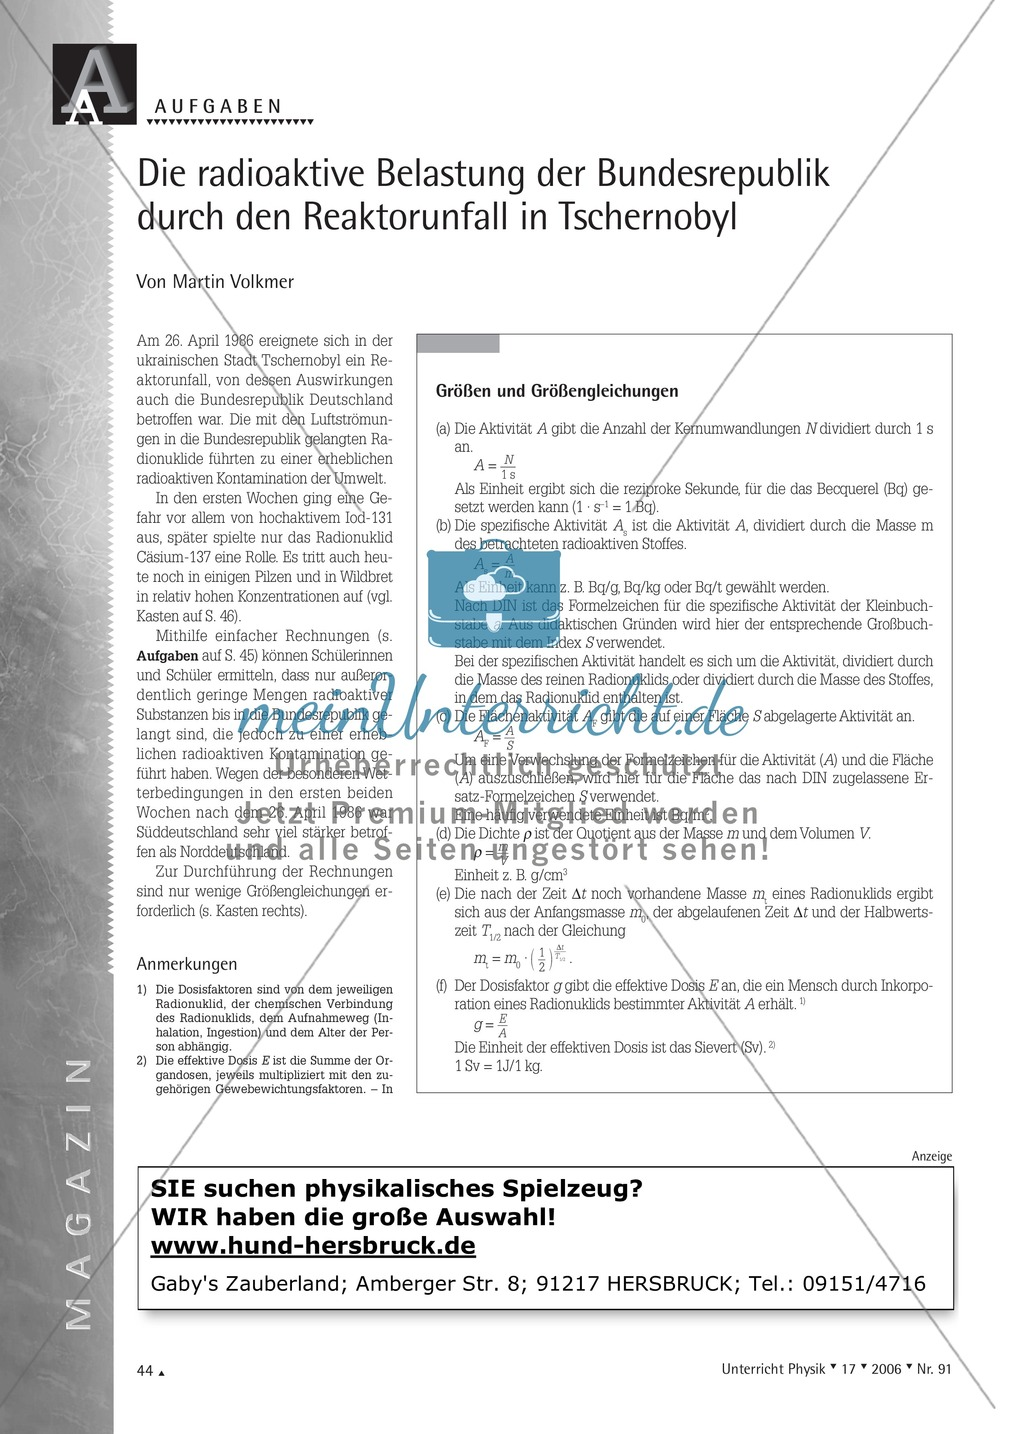 Kernphysik: Die radioaktive Belastung der Bundesrepublik durch den ...